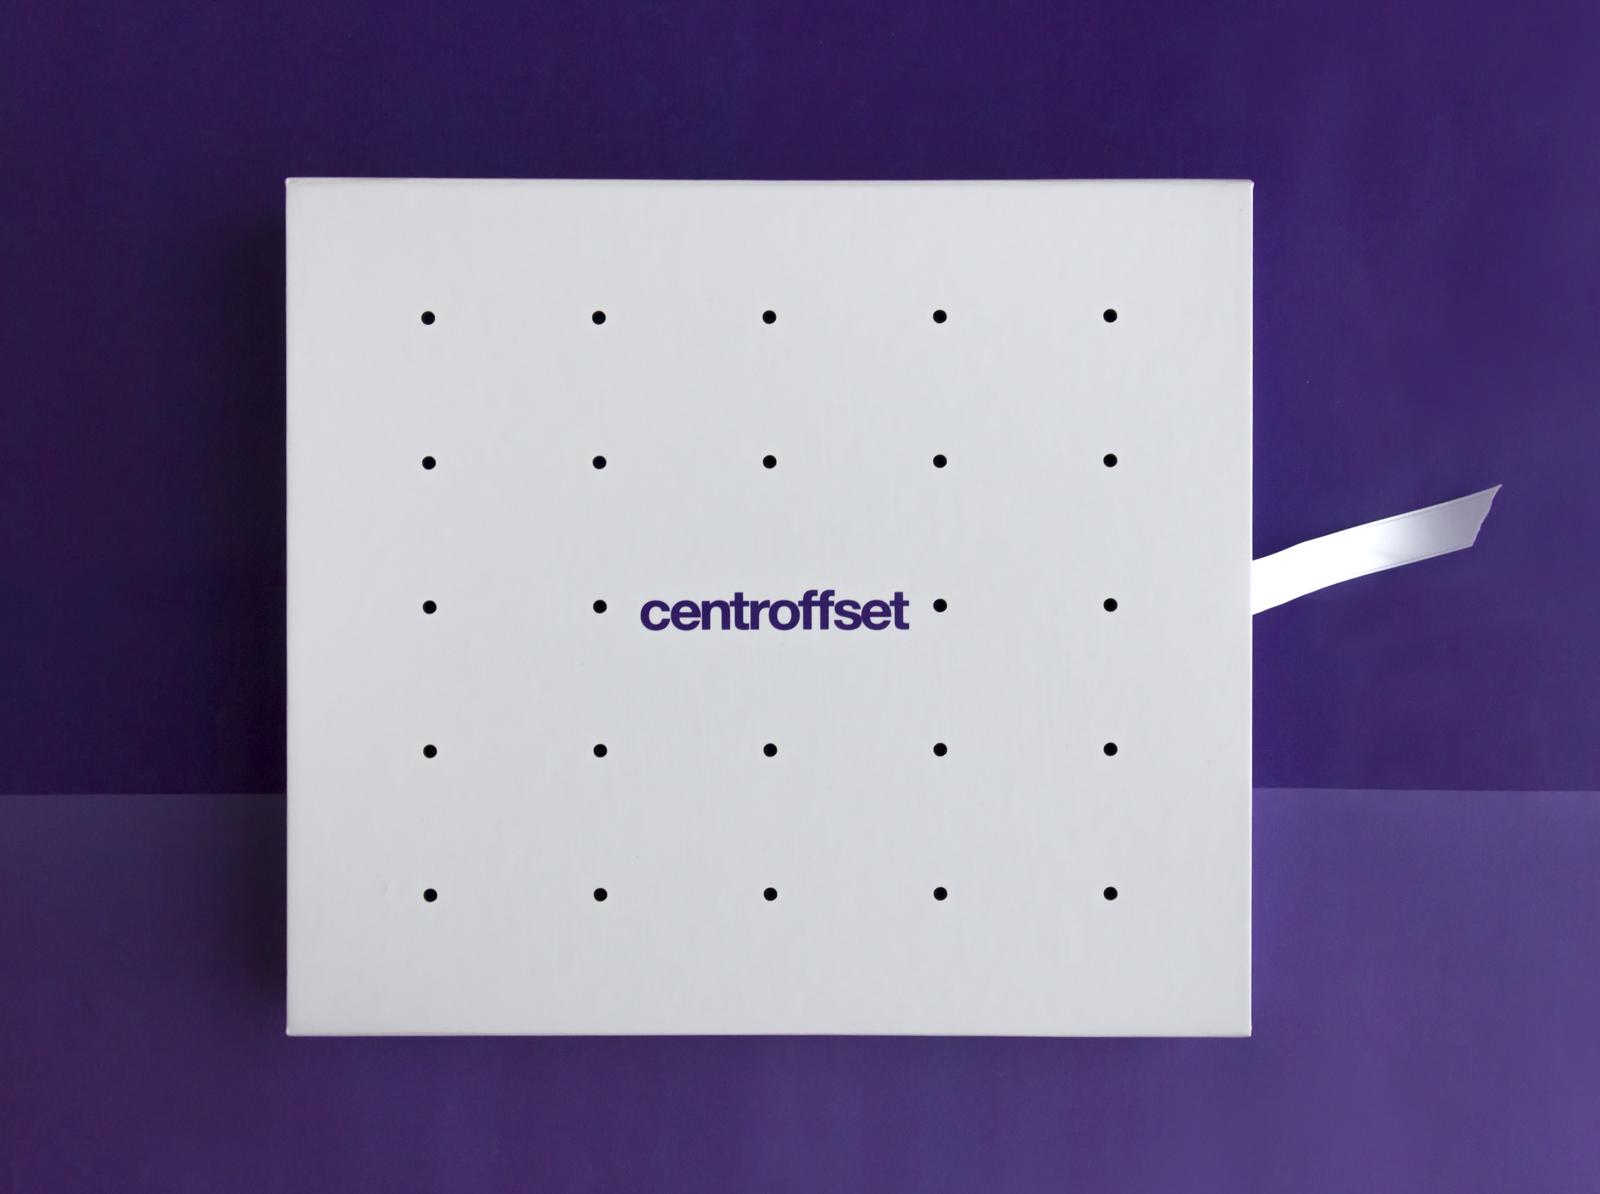 Centroffset